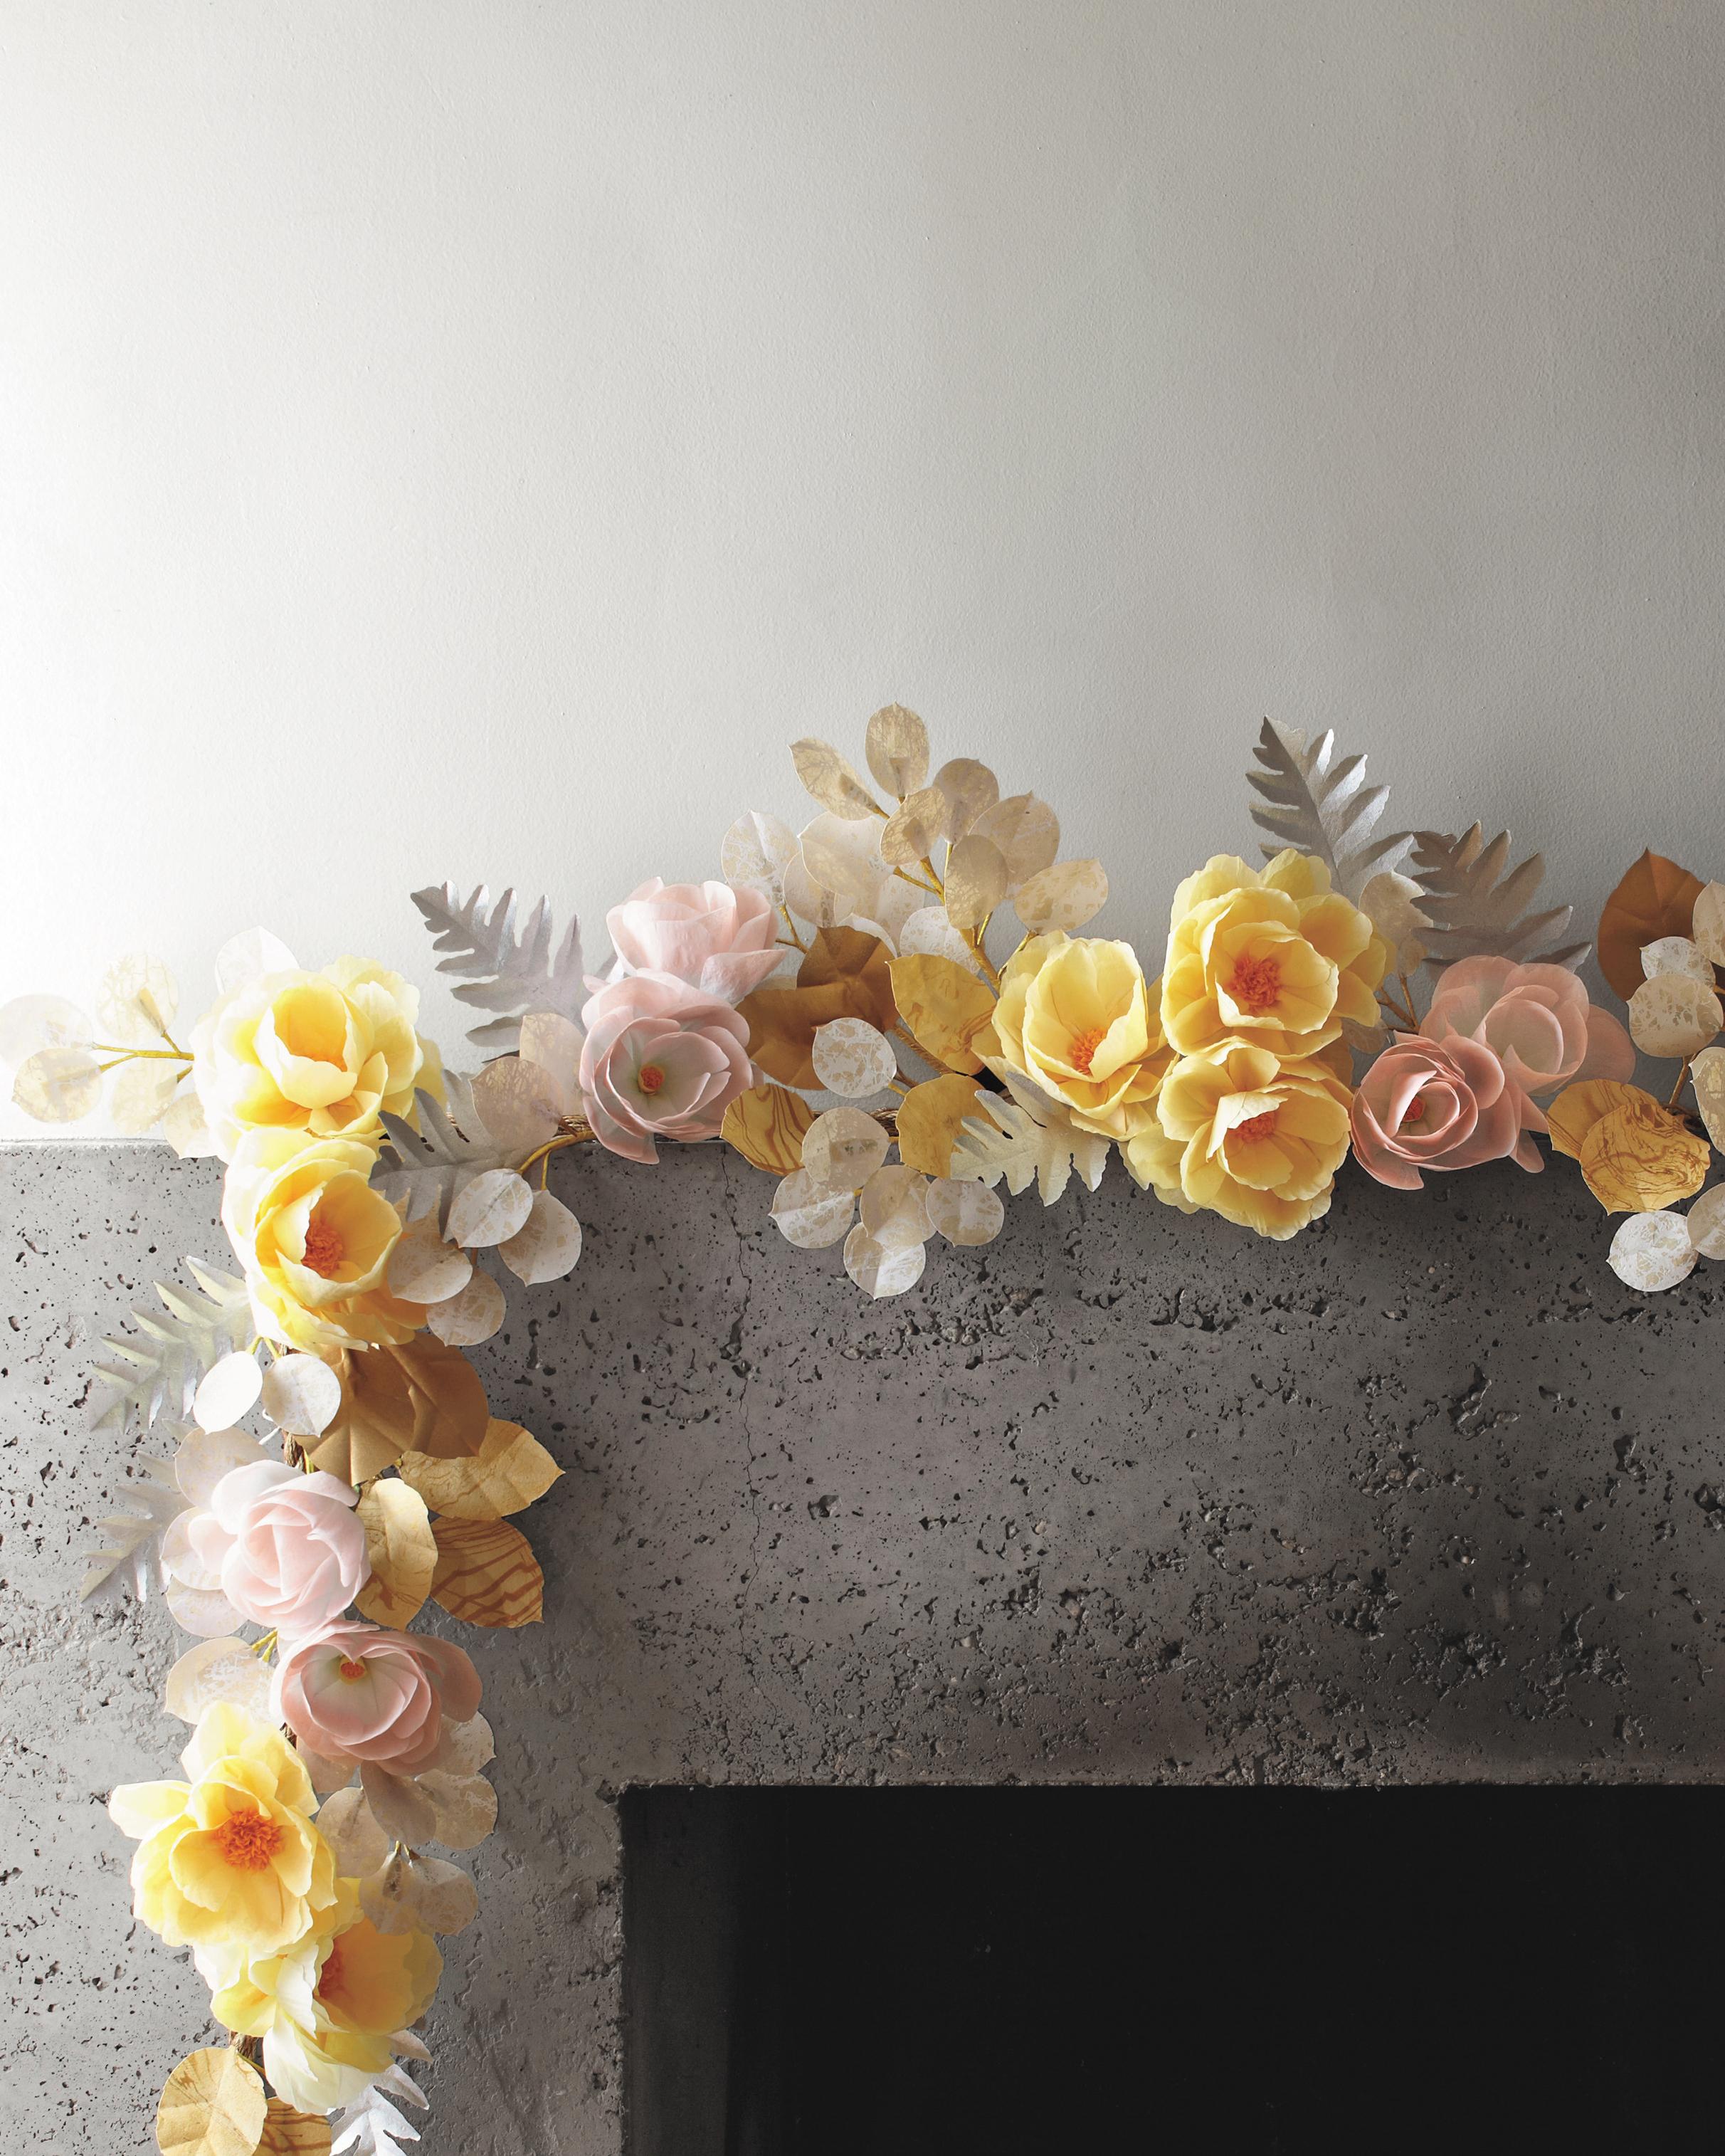 exquisite-book-of-paper-flowers-p155-mwds111071.jpg